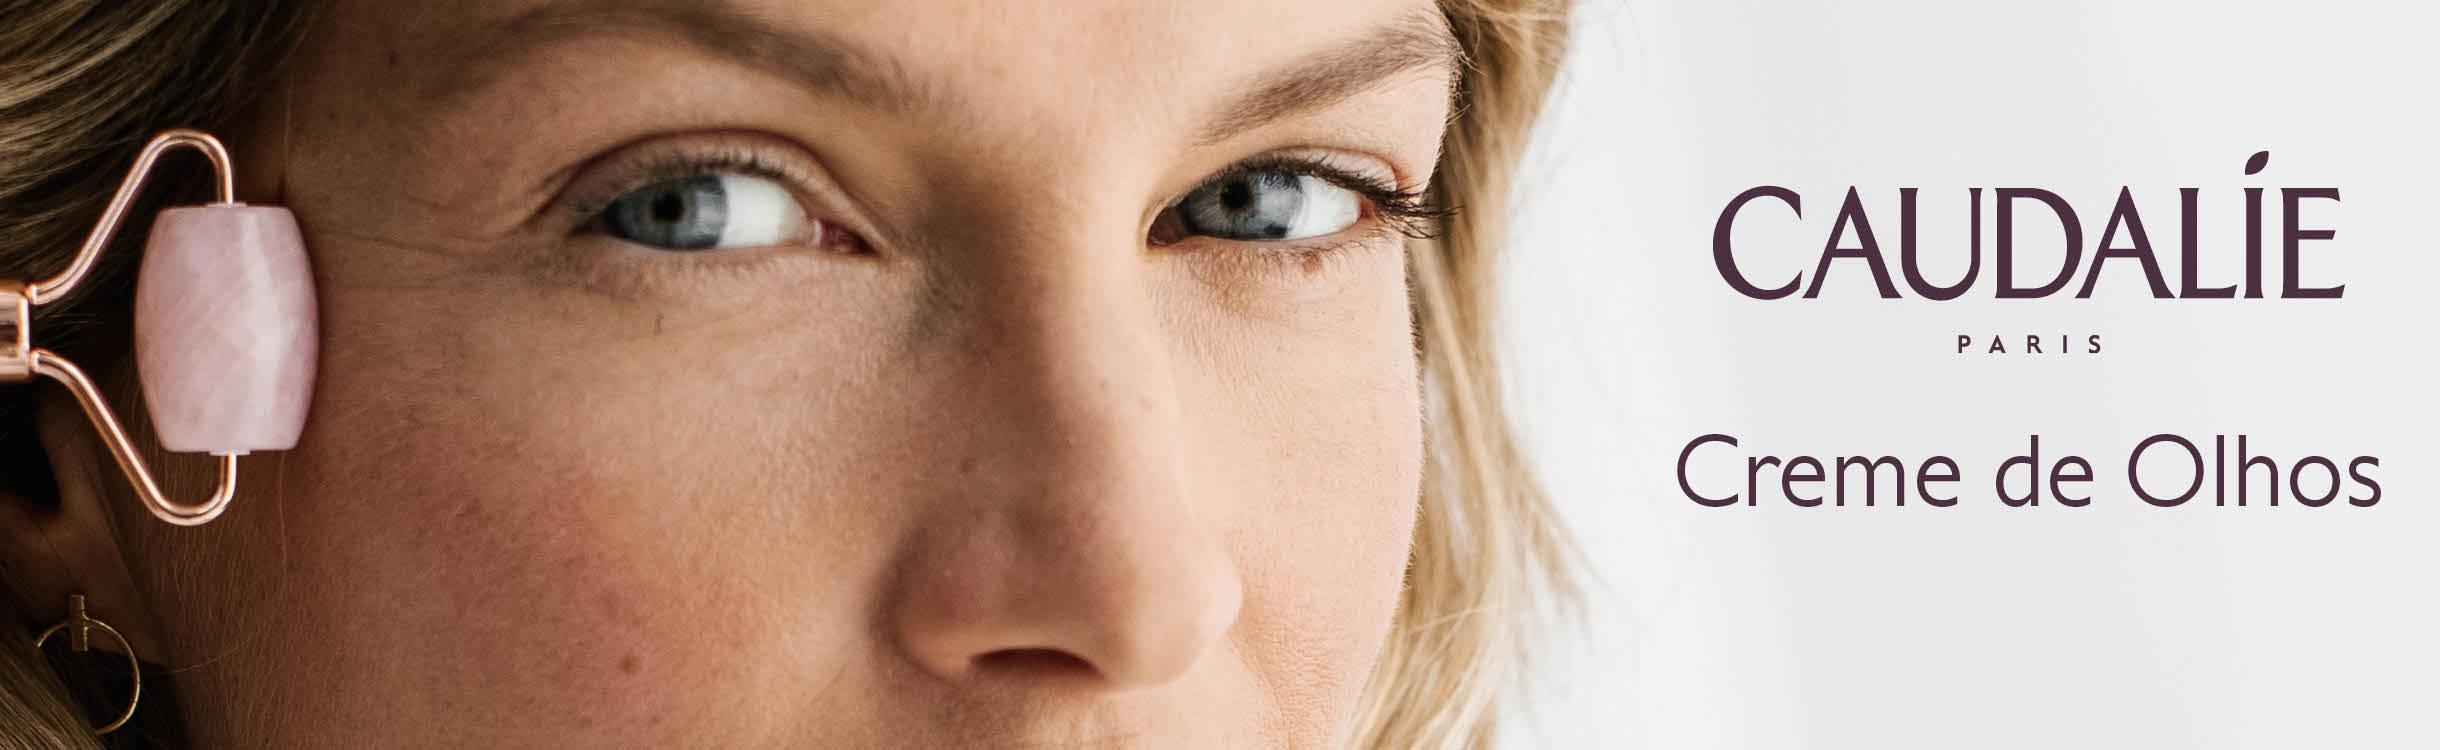 Caudalie para Olhos